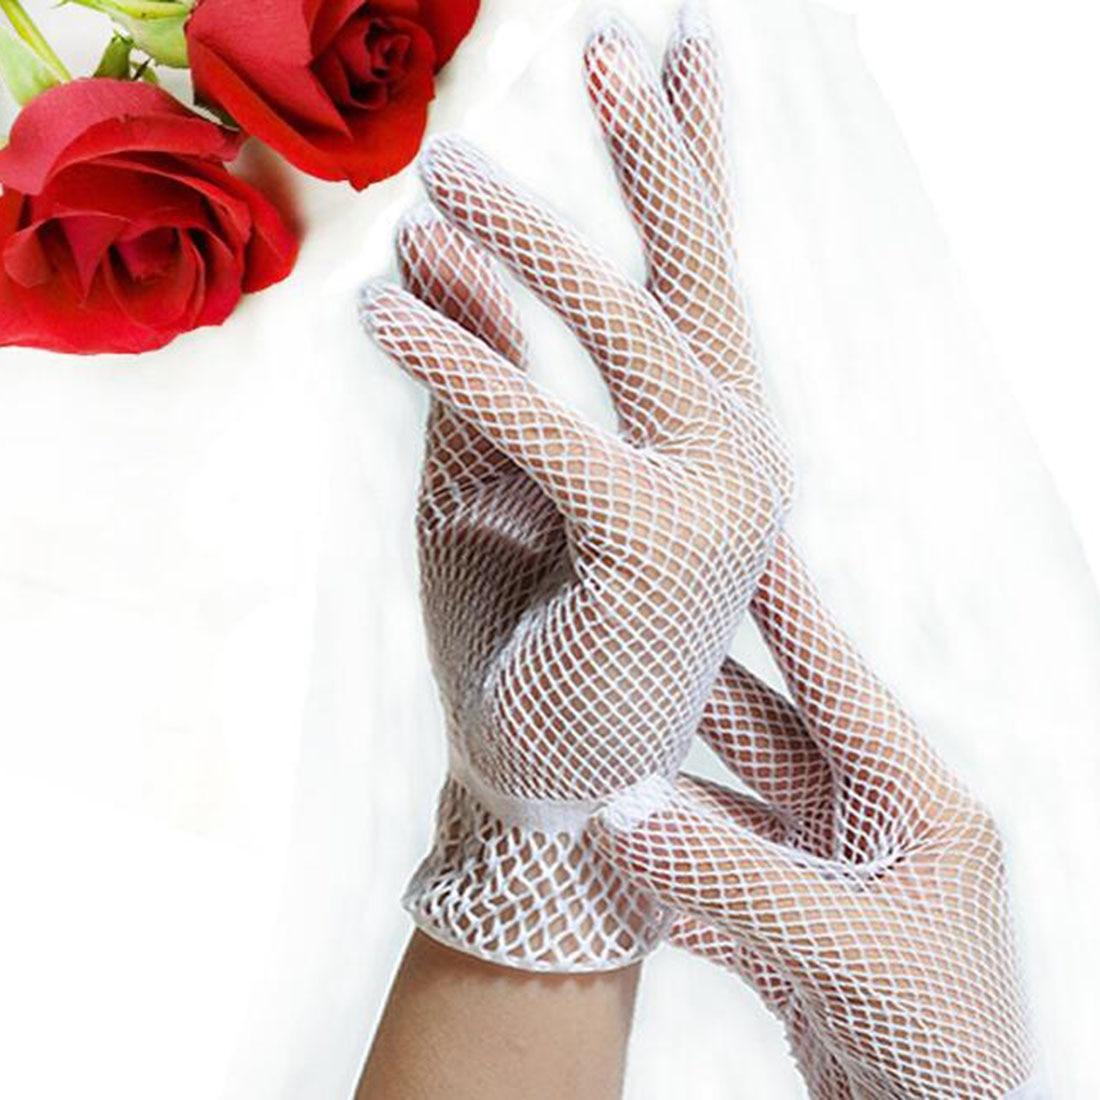 Online Get Cheap Womens Fashion Gloves -Aliexpress.com | Alibaba Group